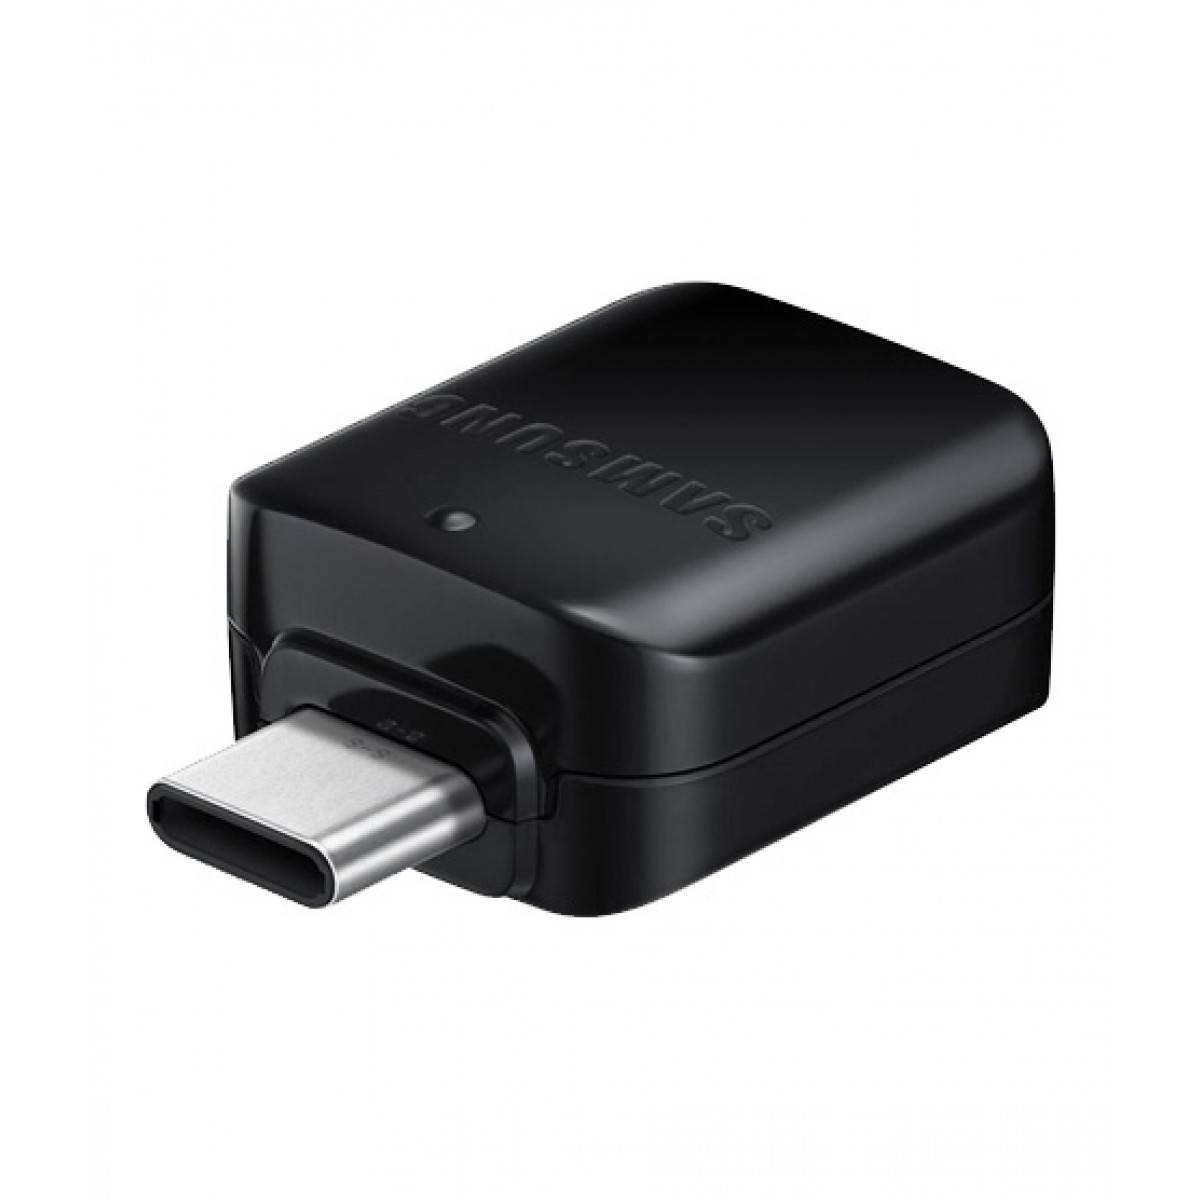 OTG USB TYPE C Adapter USB Flash Drive Connector